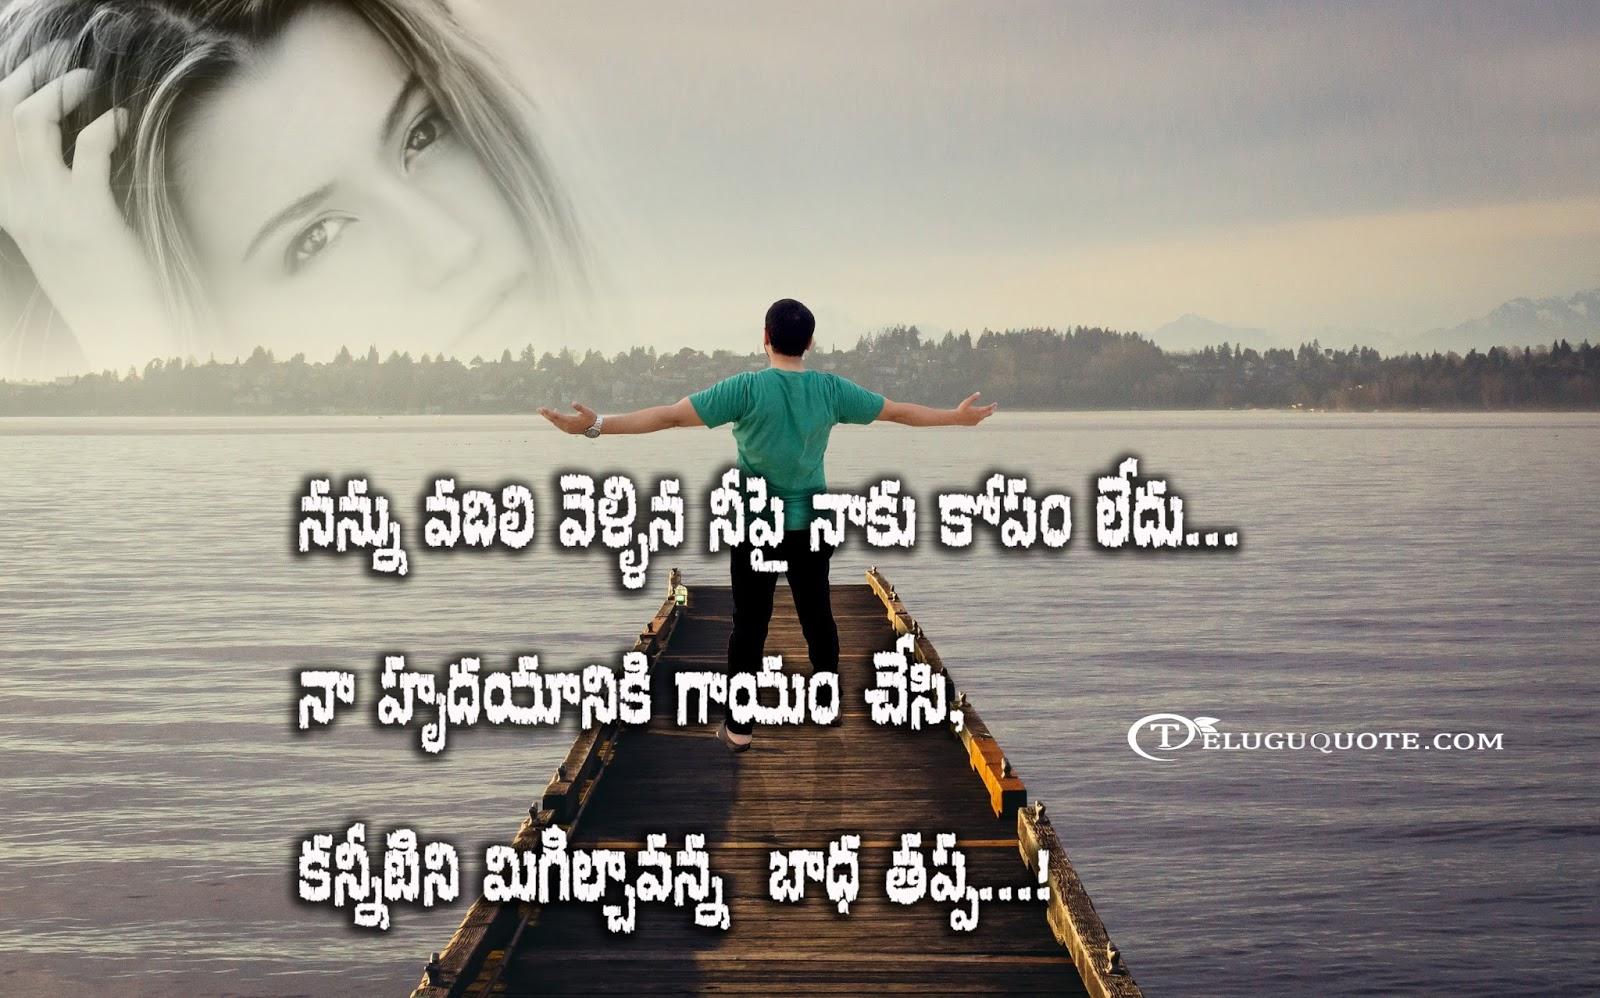 Telugu Heart Touching Love Failure Quotes - Telugu Quotes